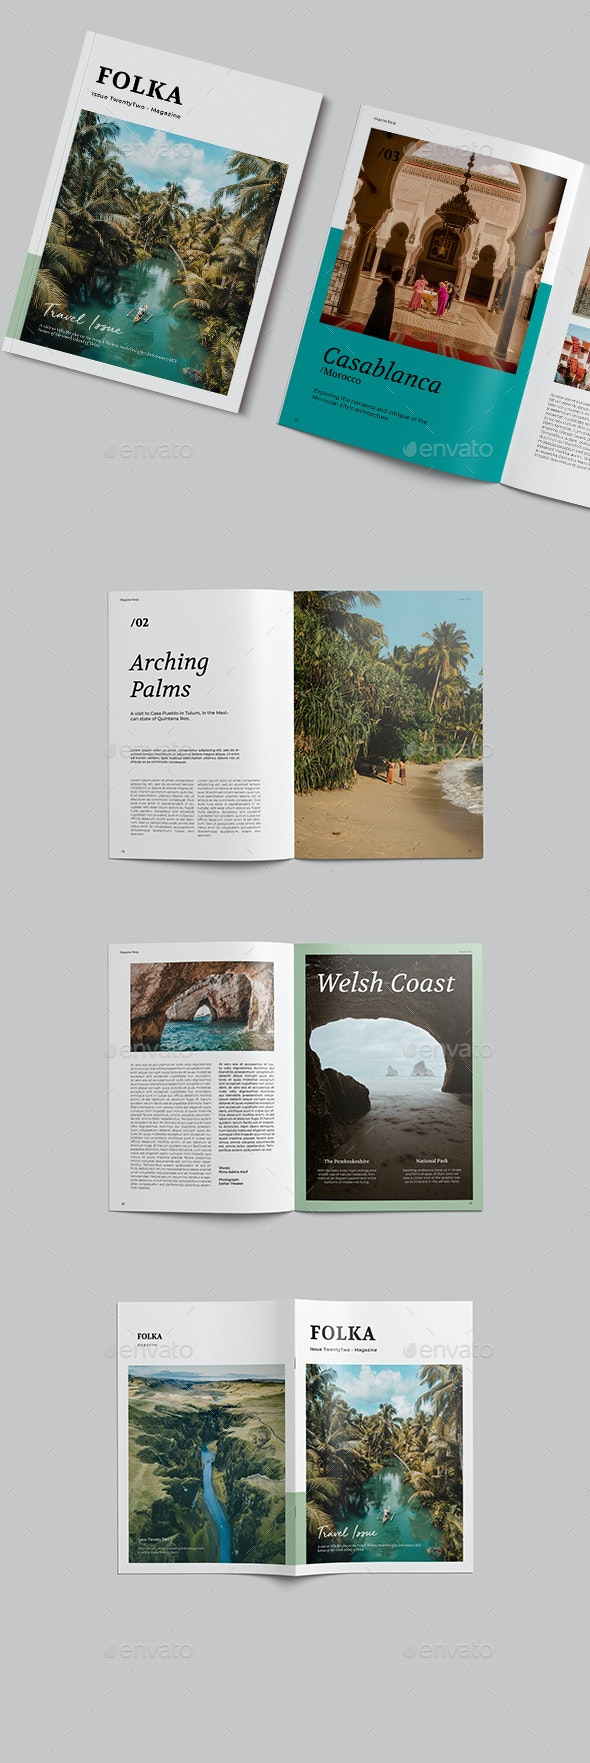 Travel Magazine Template - Magazines Print Templates